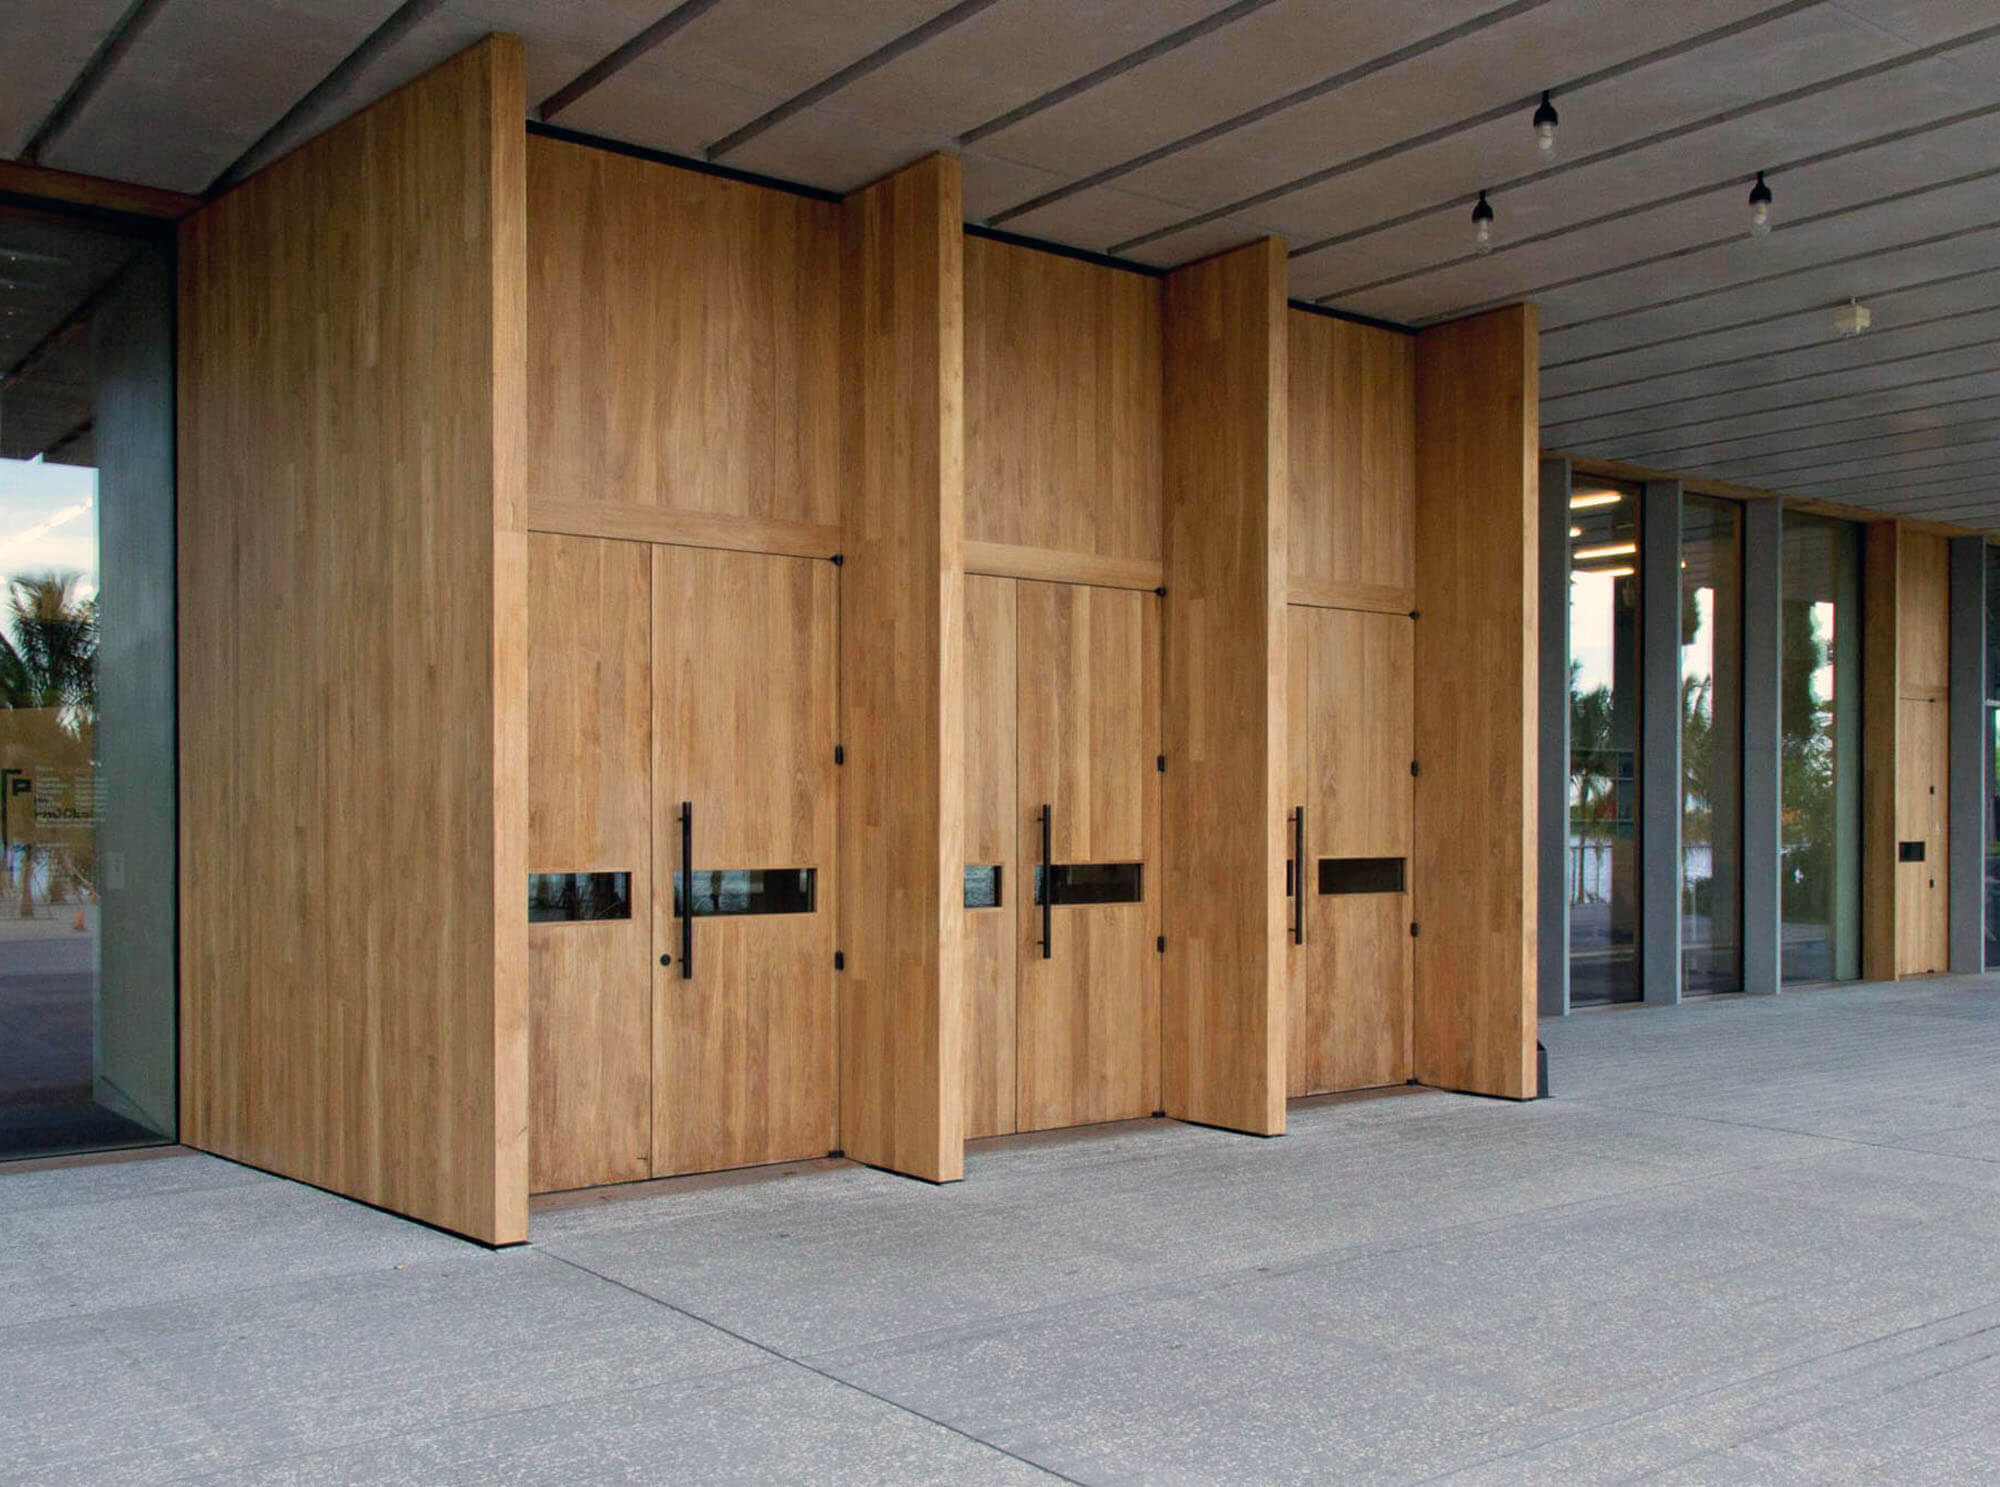 TEAK ENTRY DOORS FRONT ENTRANCE OF THE MIAMI PEREZ ART MUSEUM.